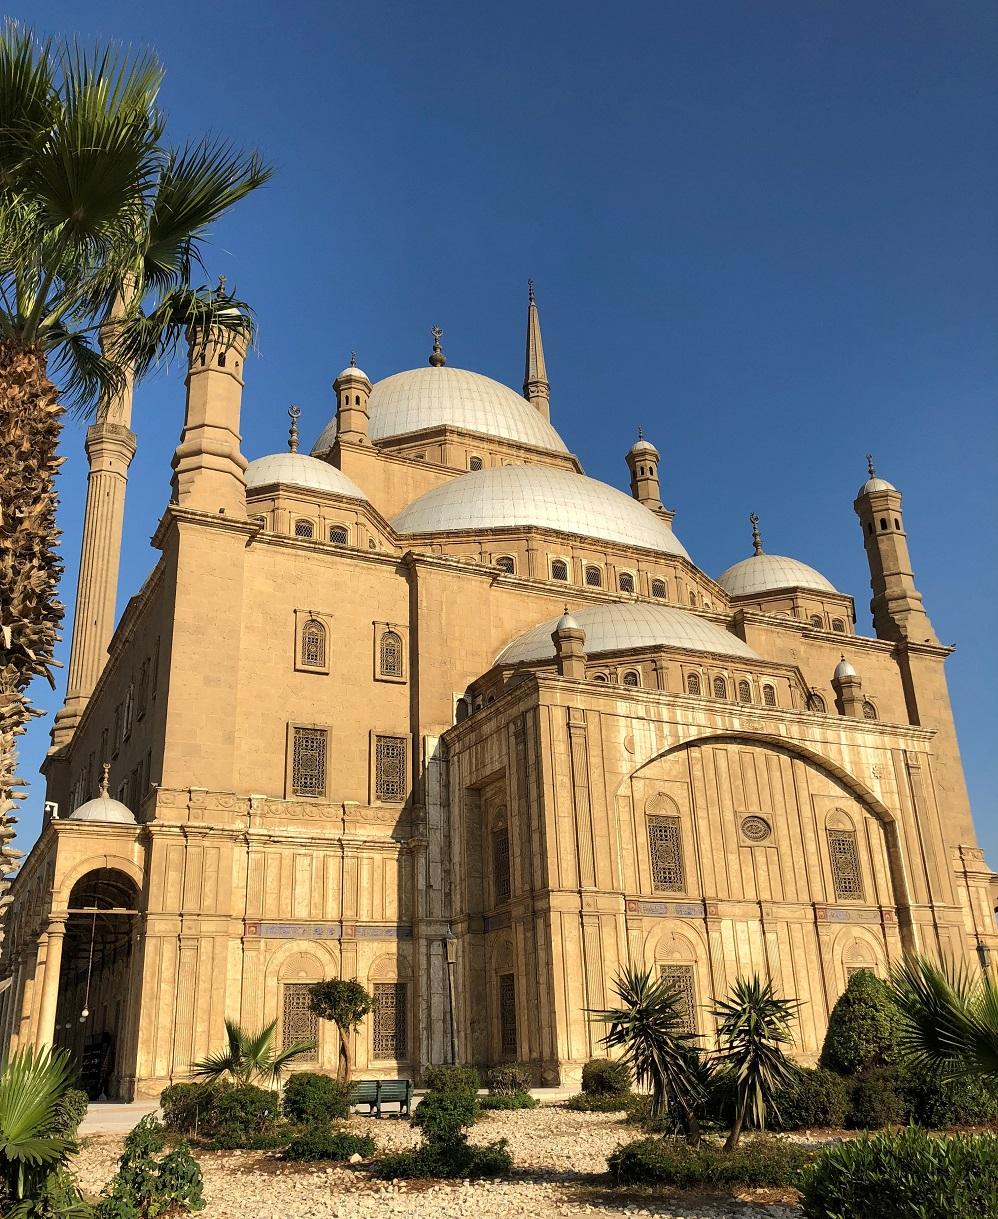 Blue Mosque in Citadel of Saladin, Cairo